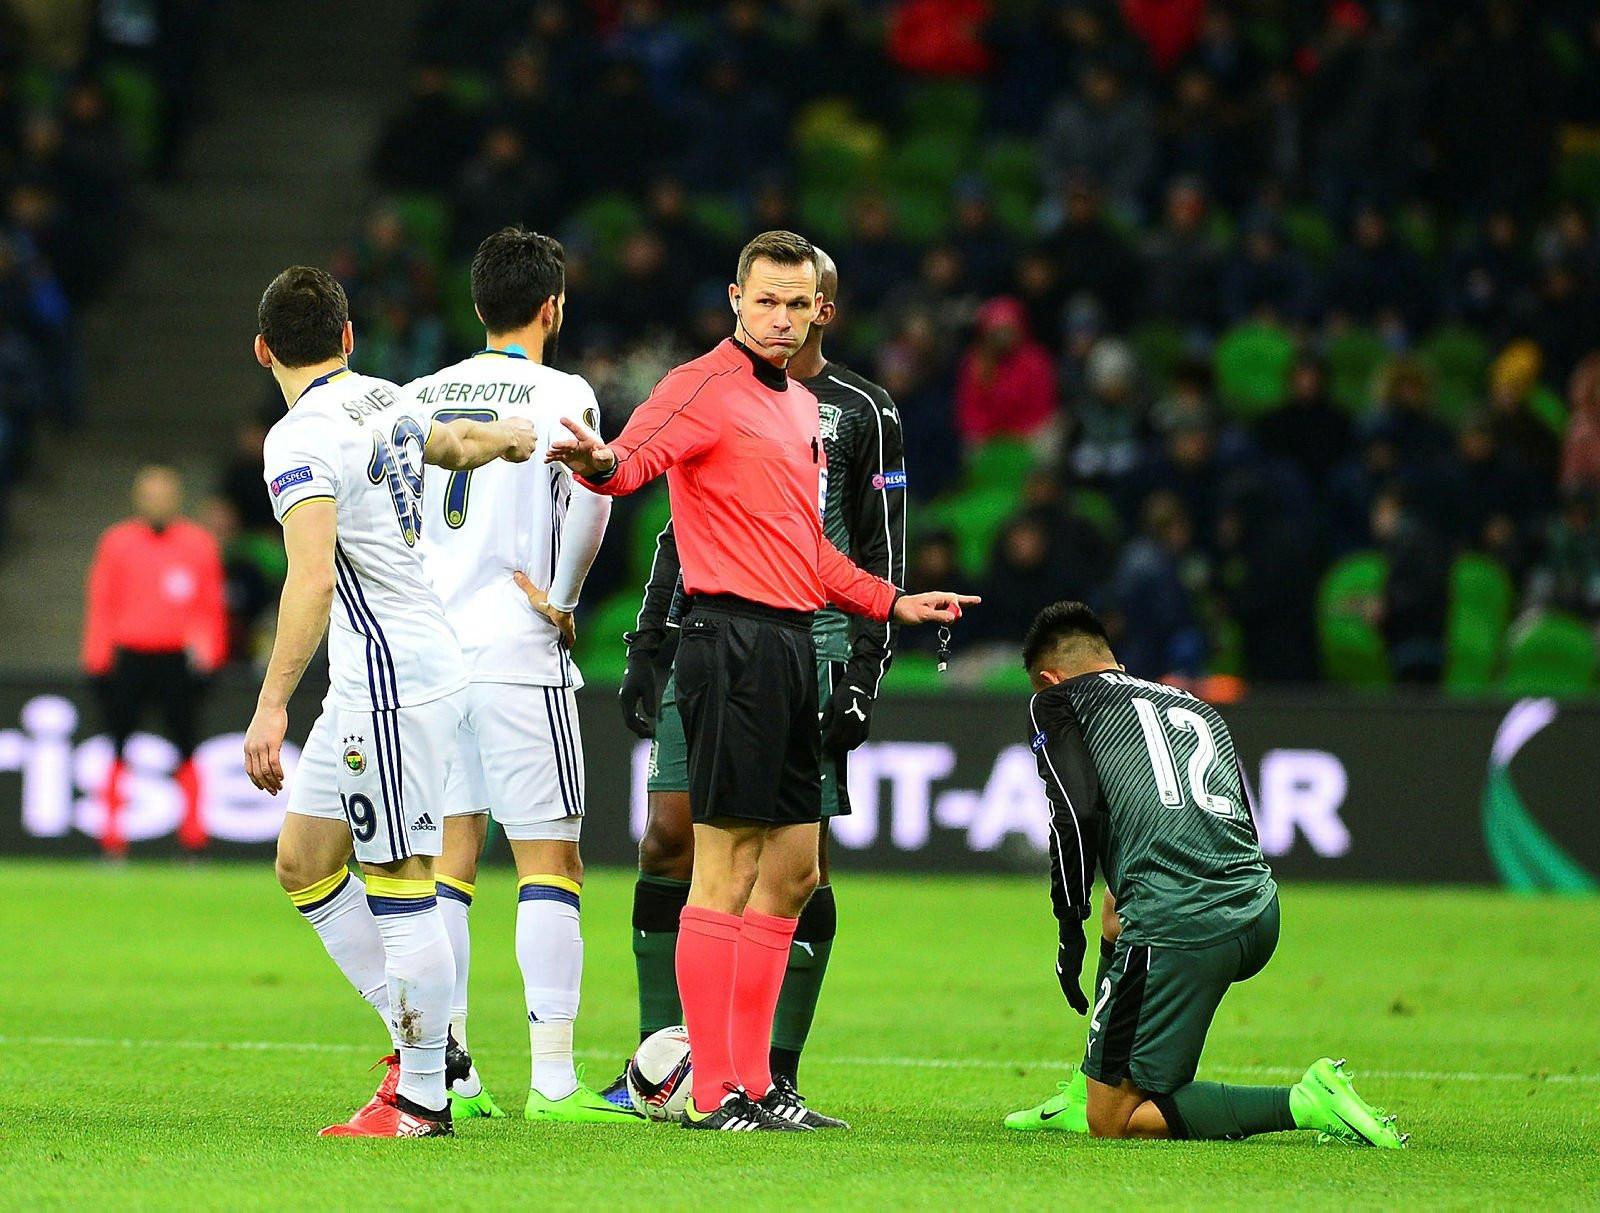 Galatasaray - Brugge maçı ne zaman saat kaçta hangi kanalda?